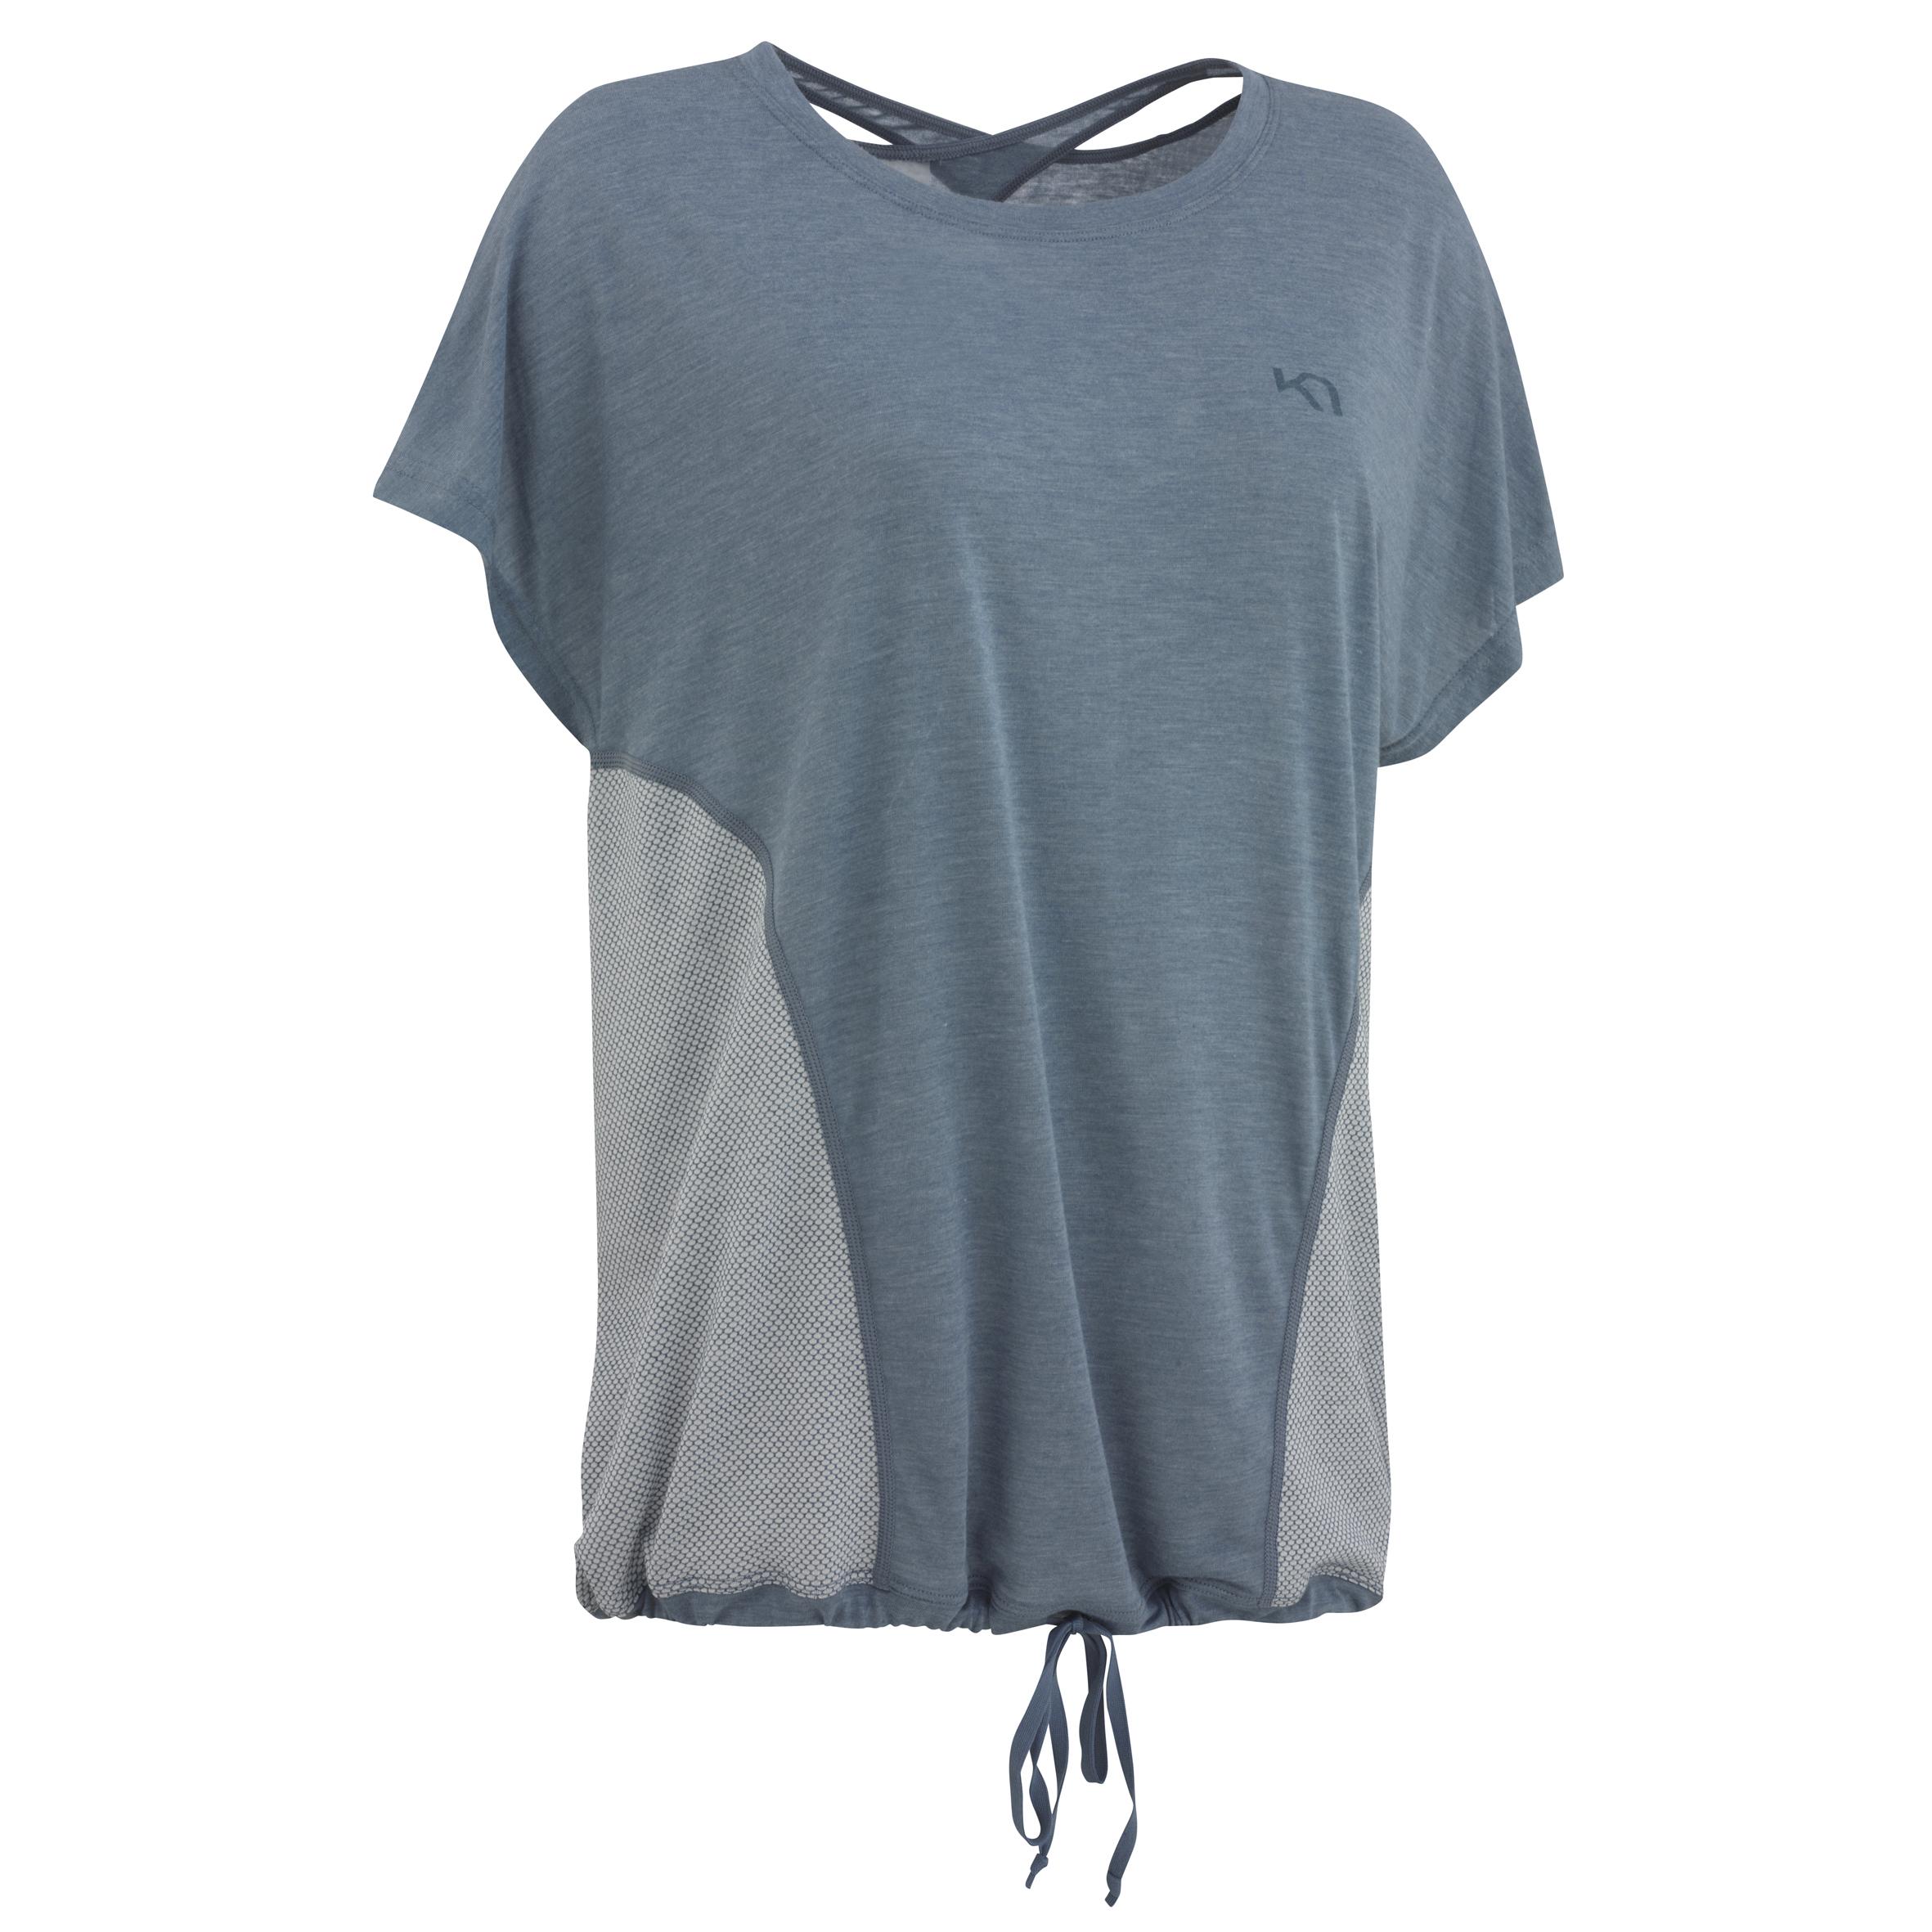 Kari Traa Isabelle t-shirt